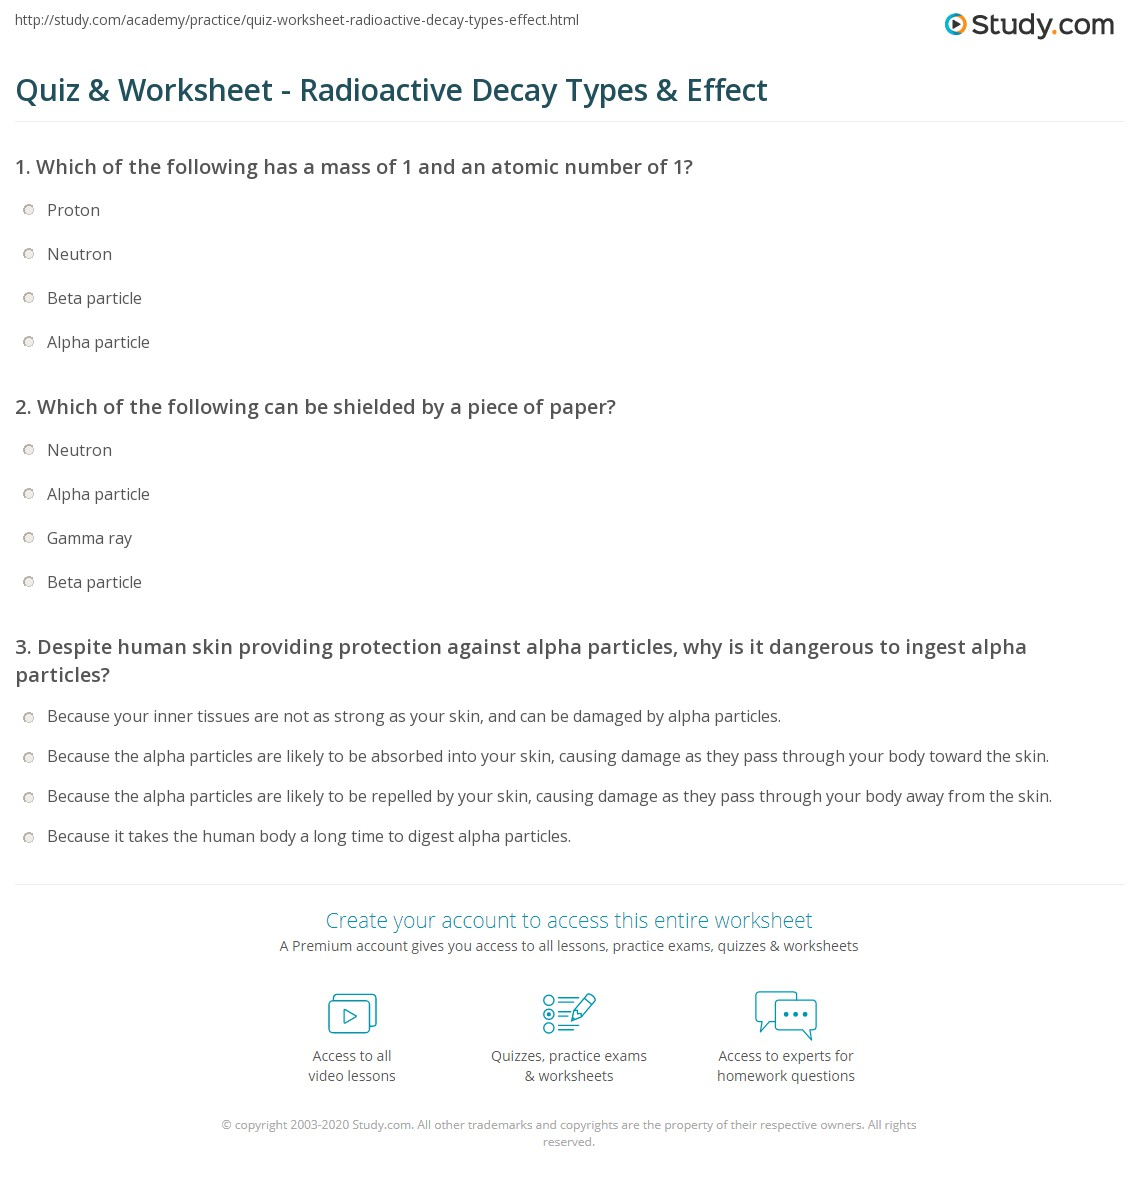 Quiz & Worksheet - Radioactive Decay Types & Effect  Study.com